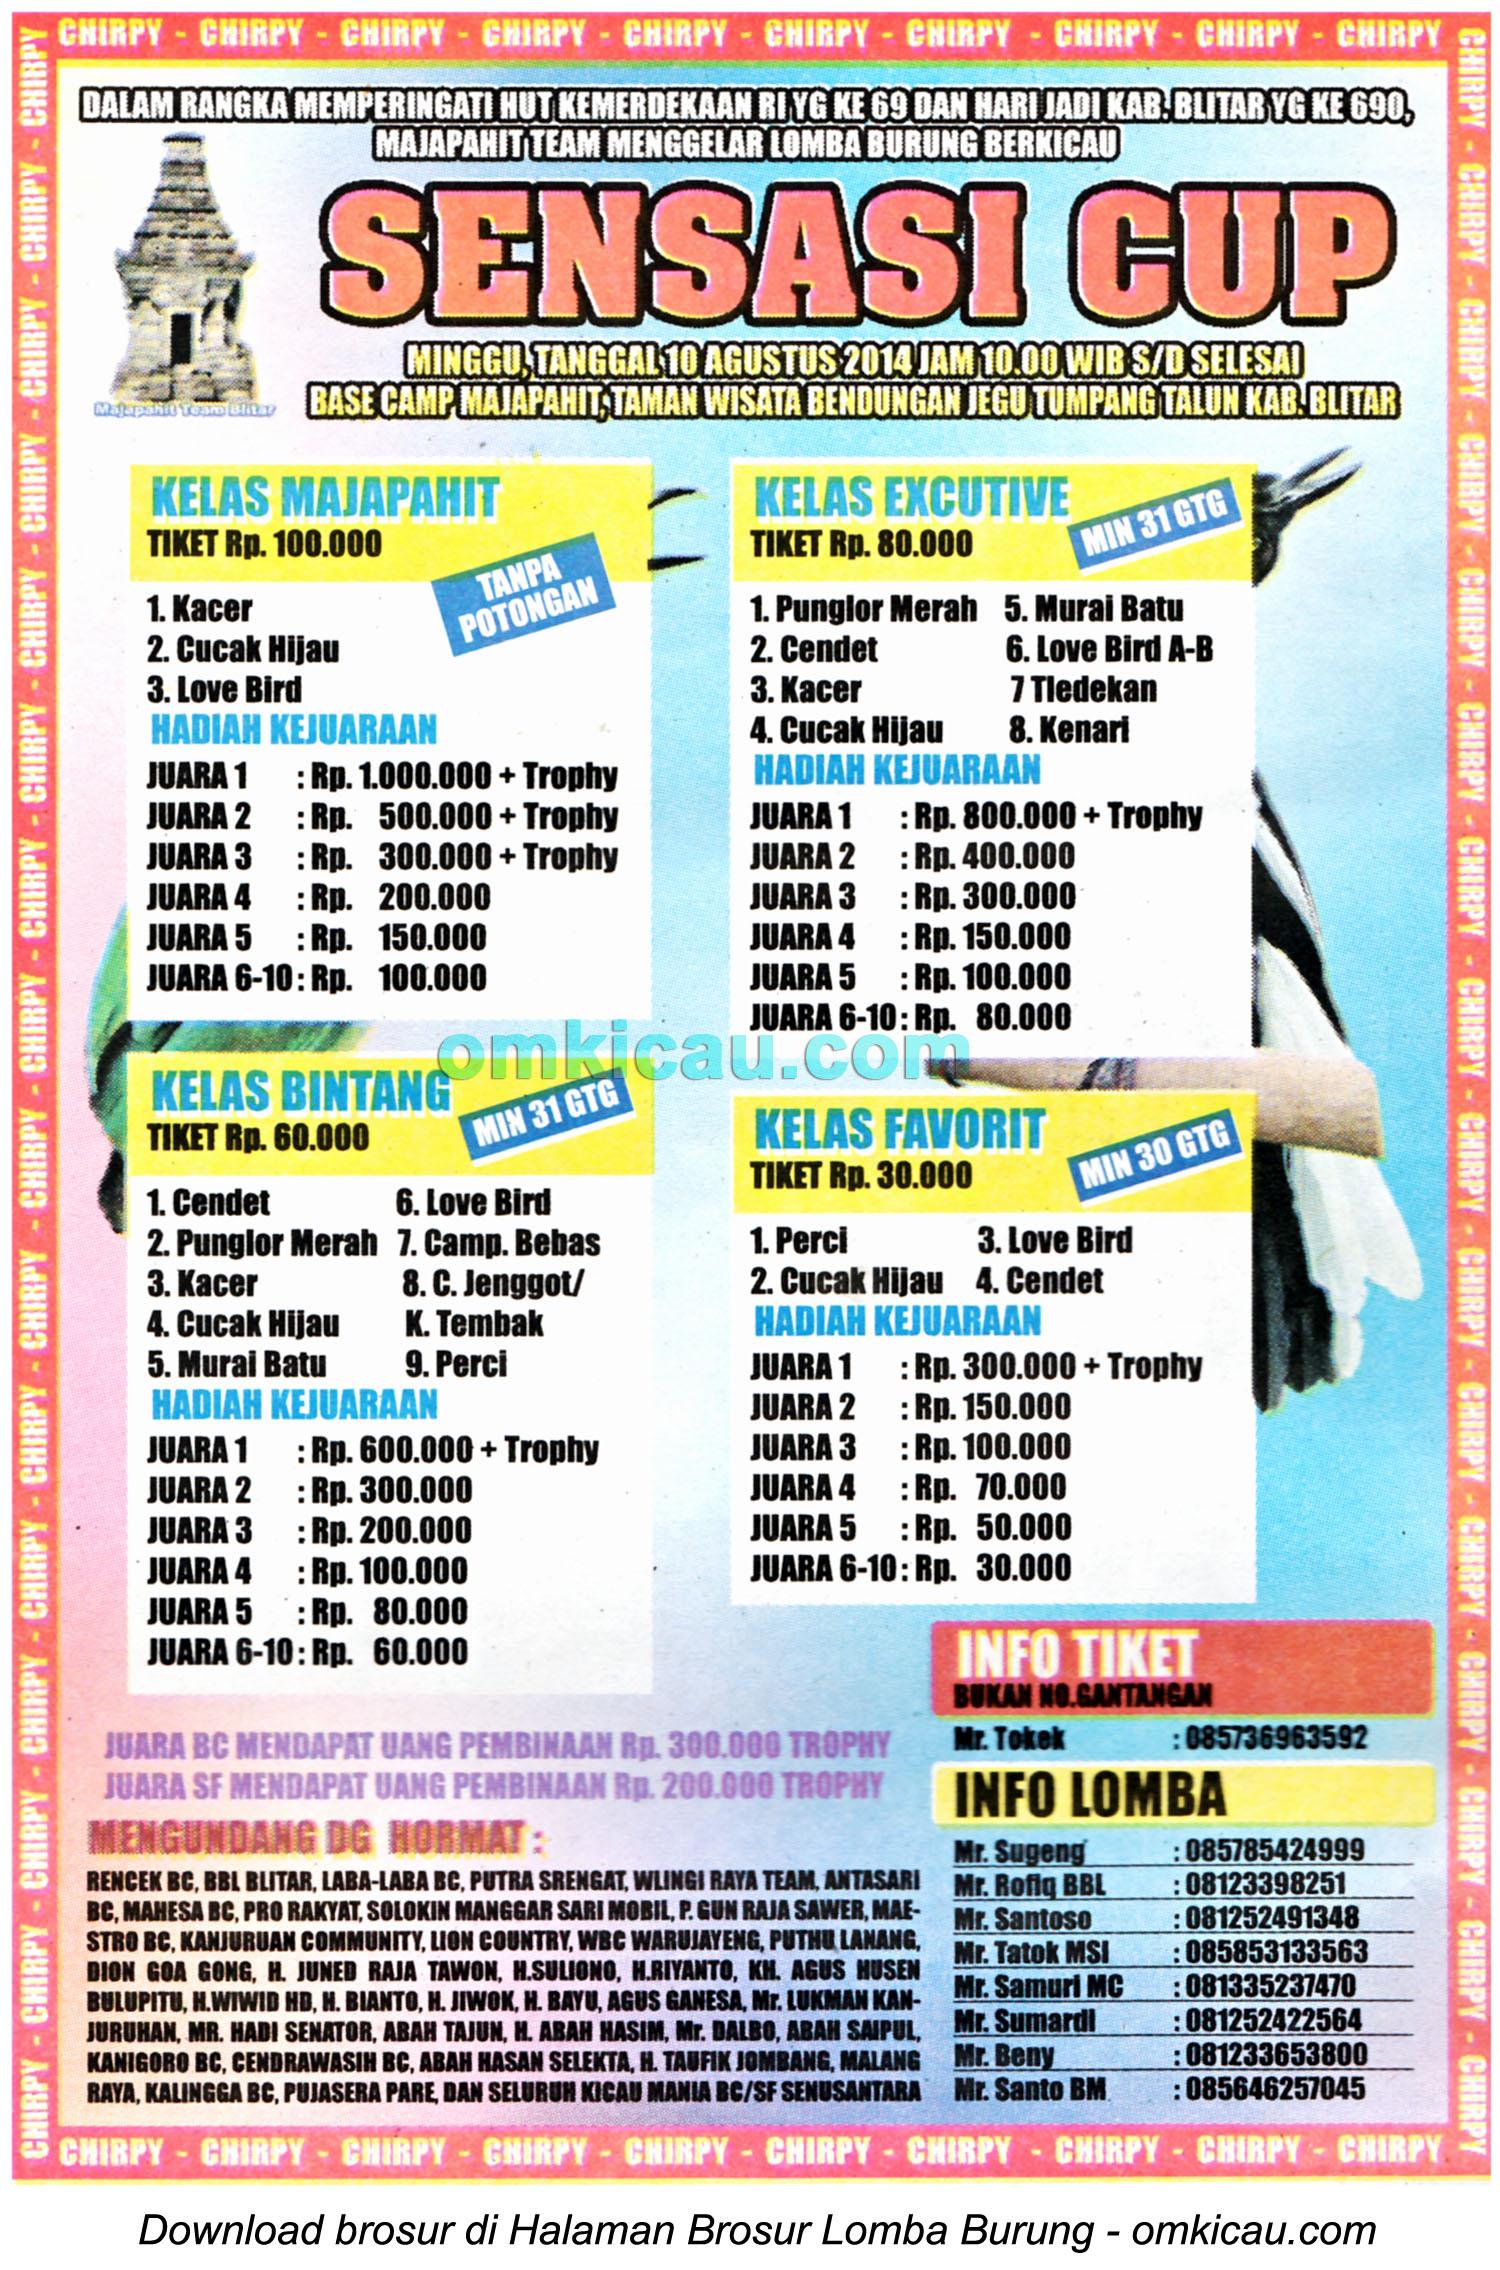 Brosur Lomba Burung Berkicau Sensasi Cup, Blitar, 10 Agustus 2014